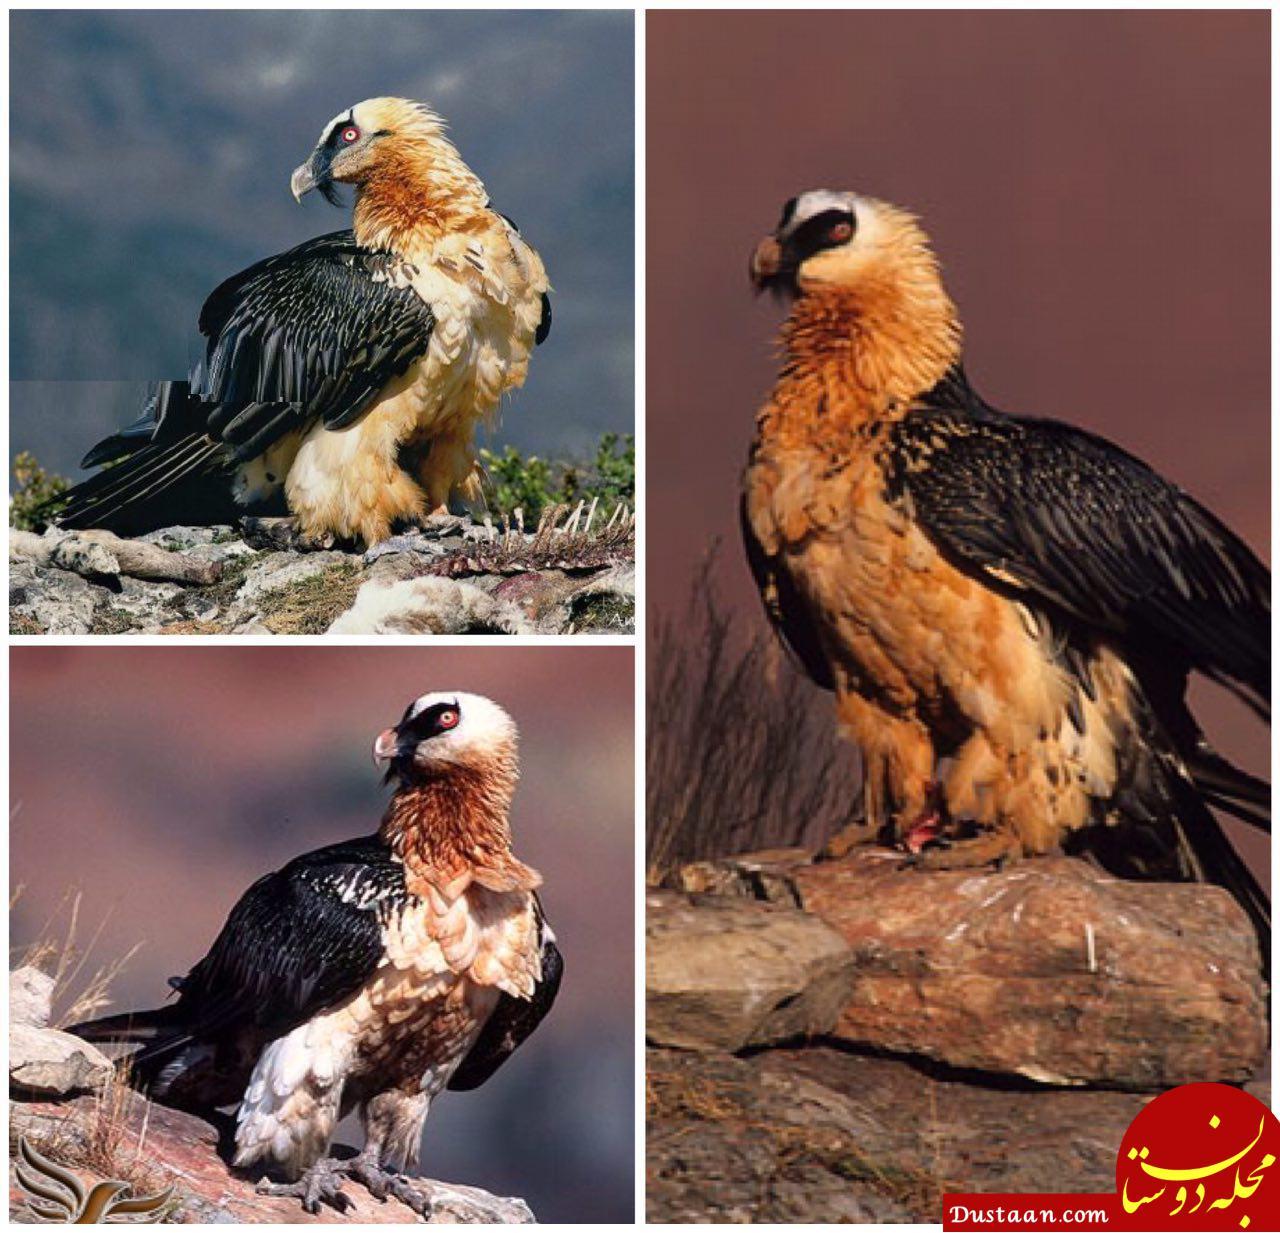 www.dustaan.com مرغ سعادت از نمایی نزدیک! +عکس